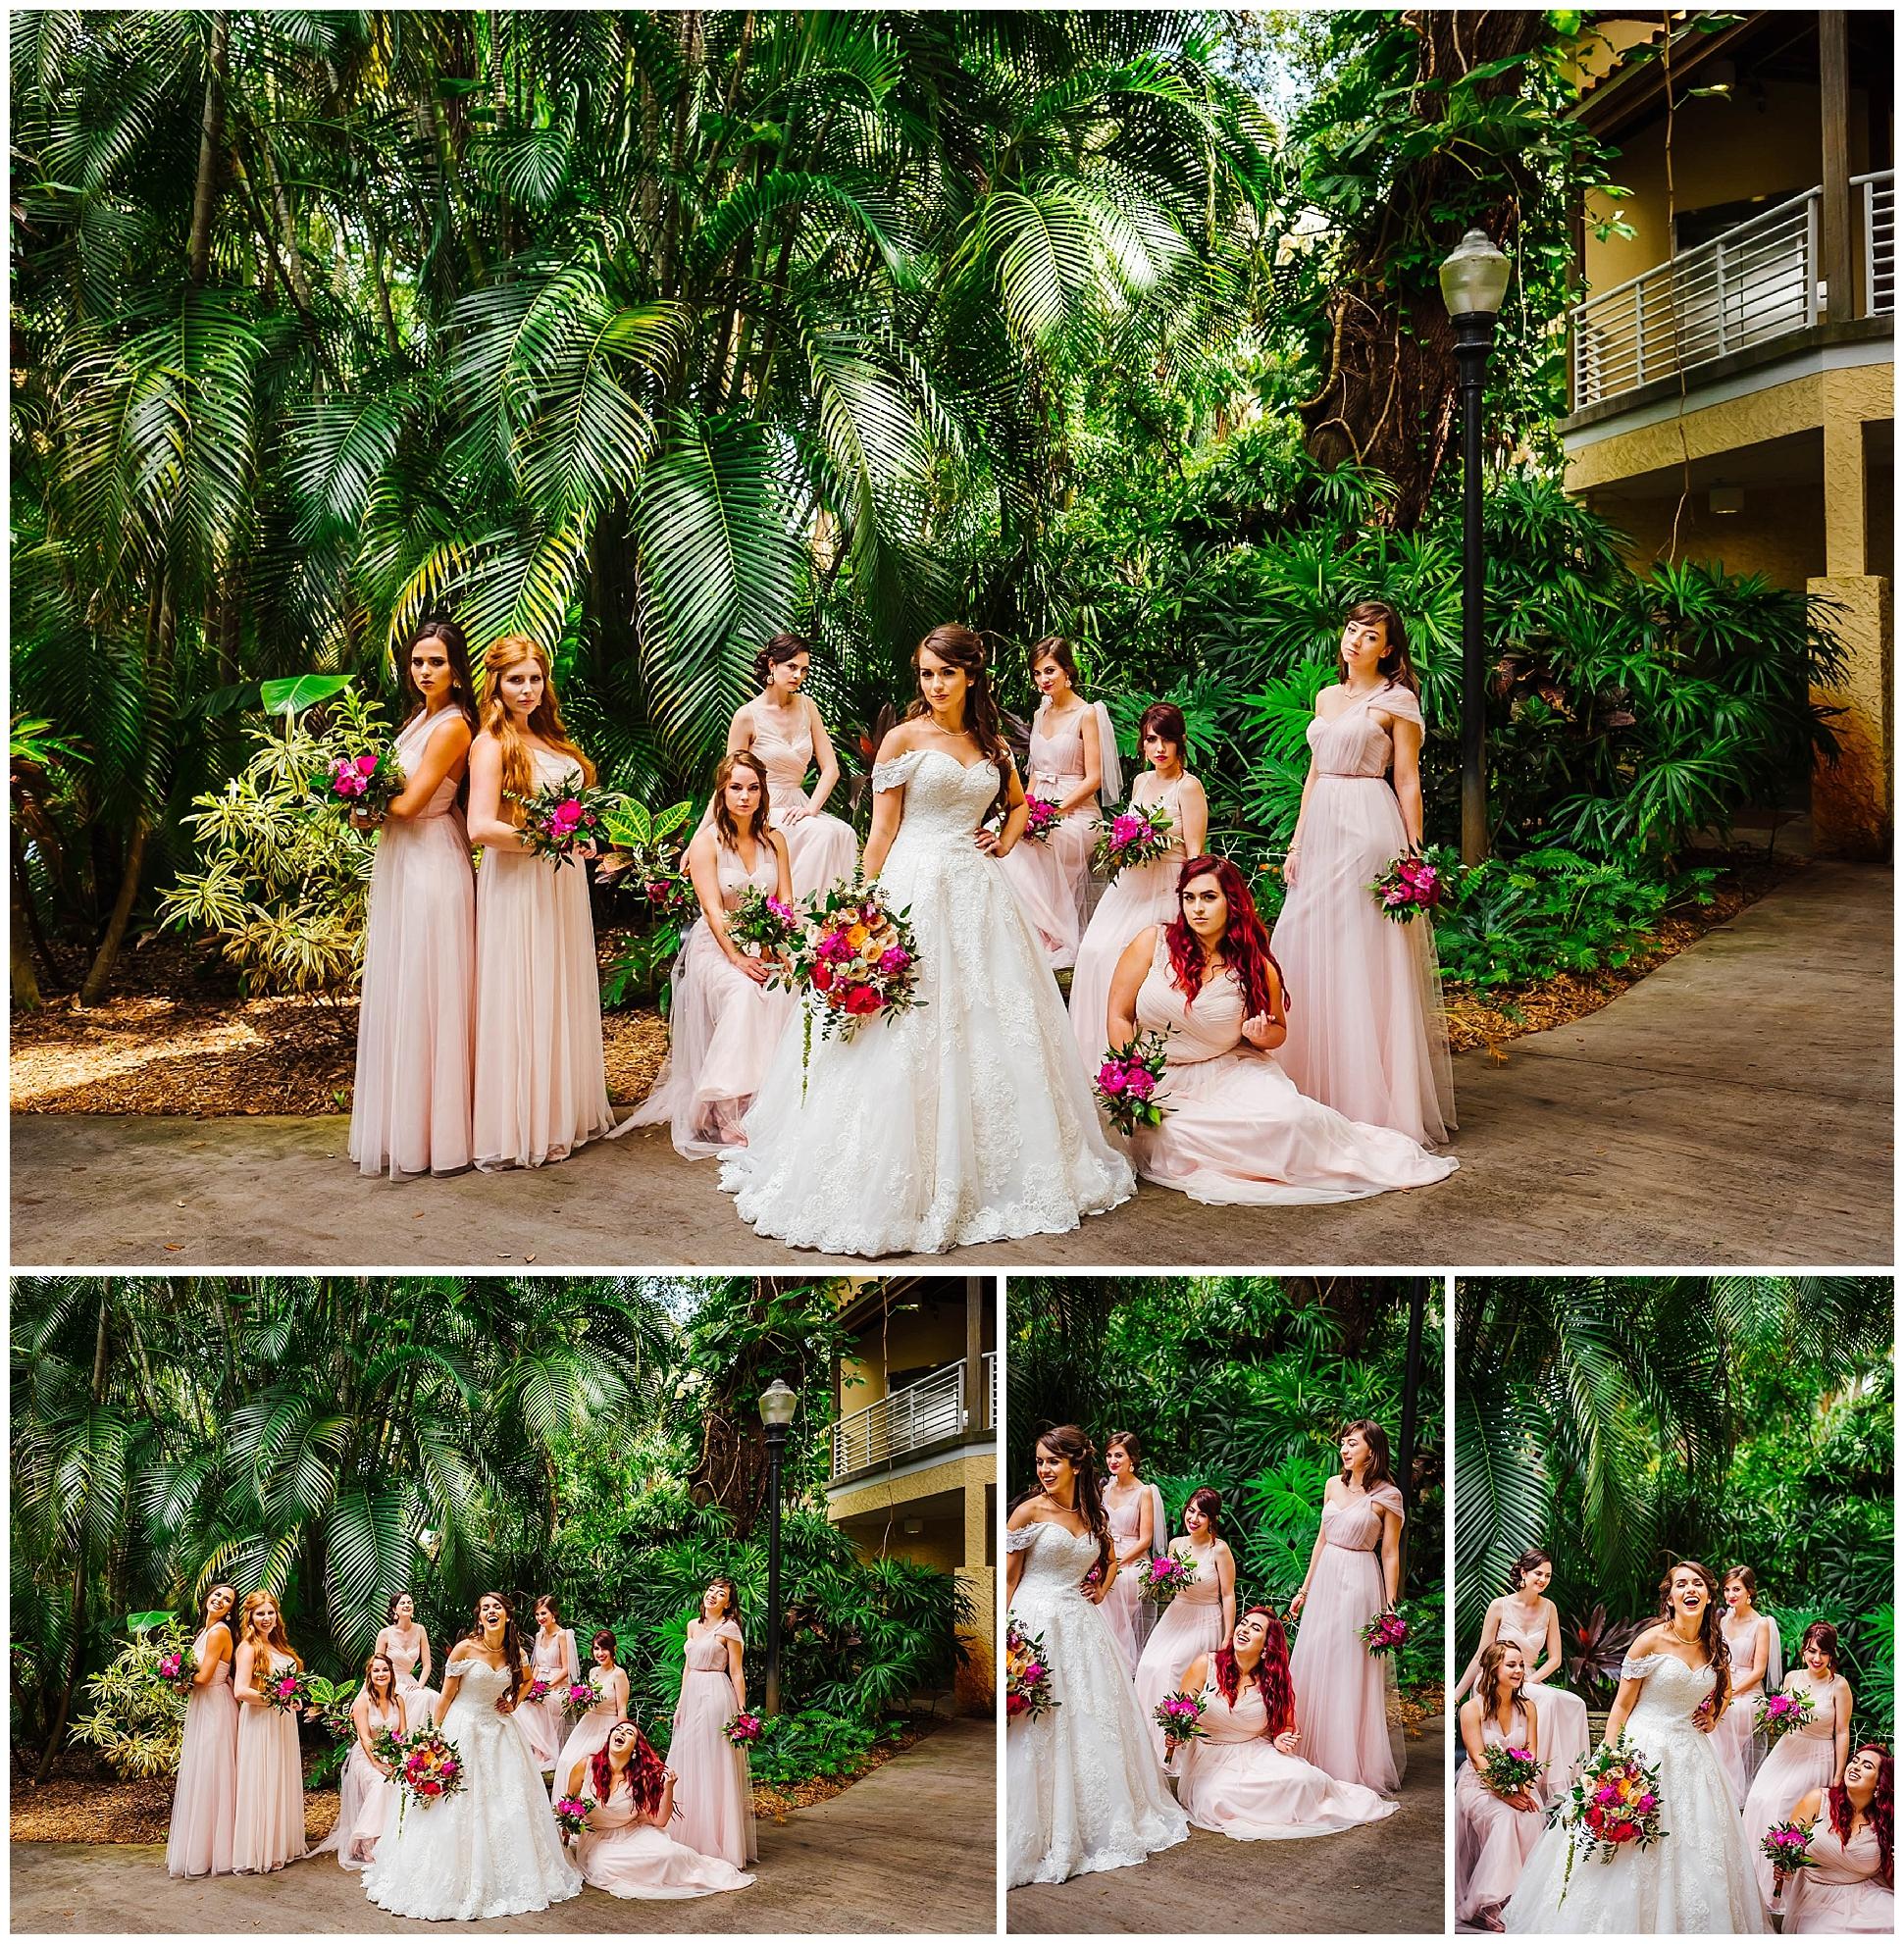 st-pete-wedding-photographer-sunken-gardens-crystal-ballroom-princess-dancer_0136.jpg